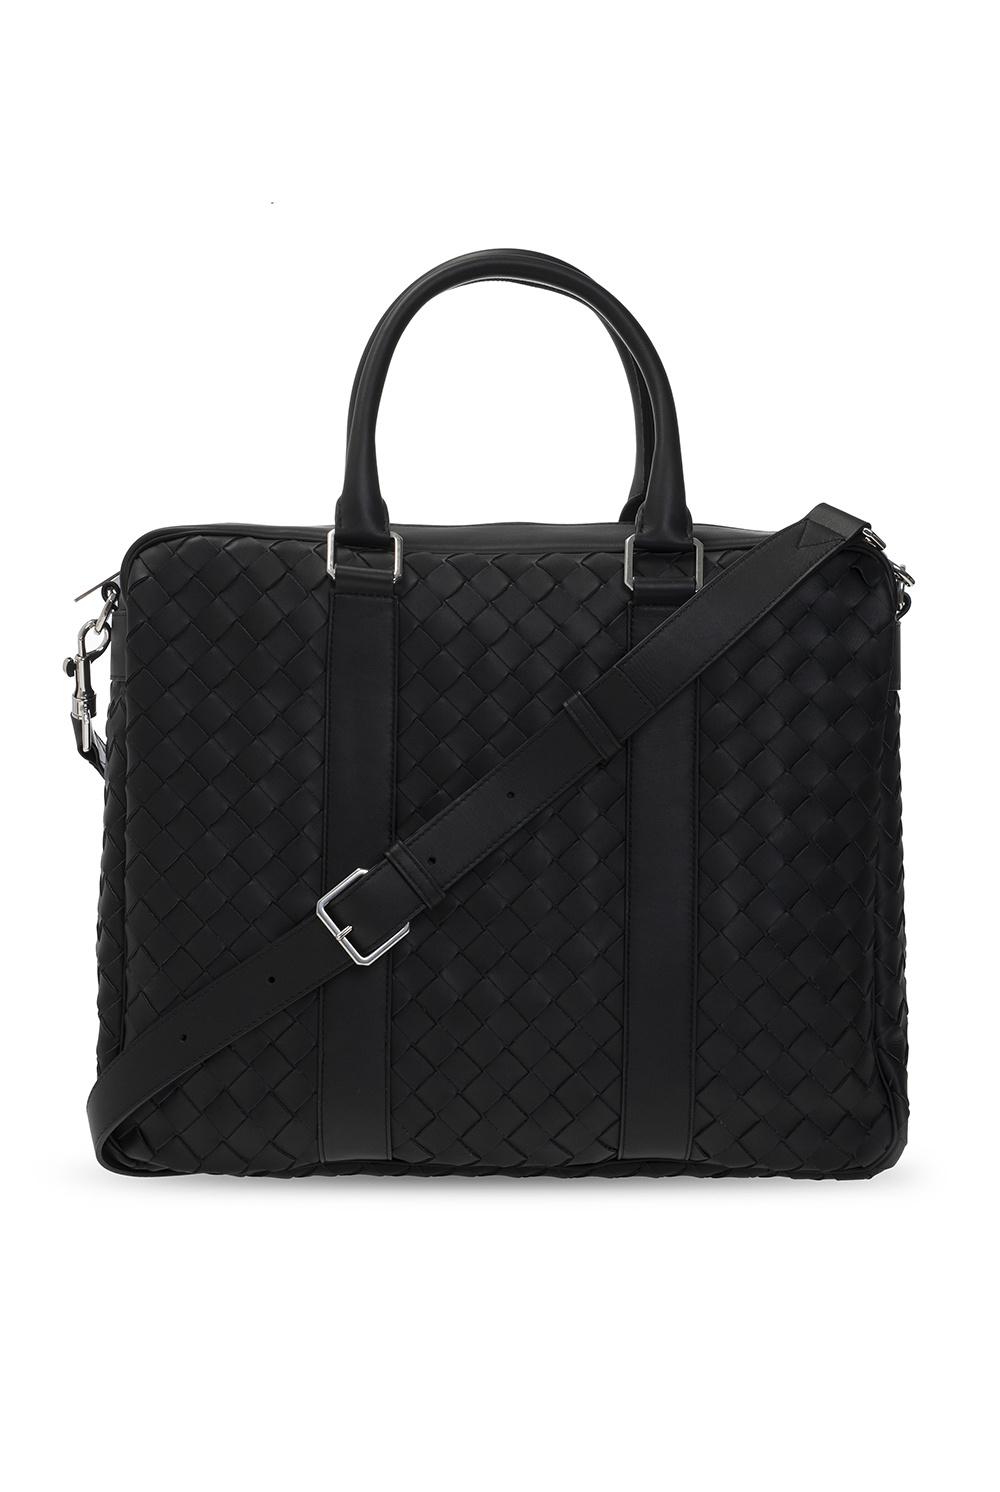 Bottega Veneta Briefcase with Intrecciato weave